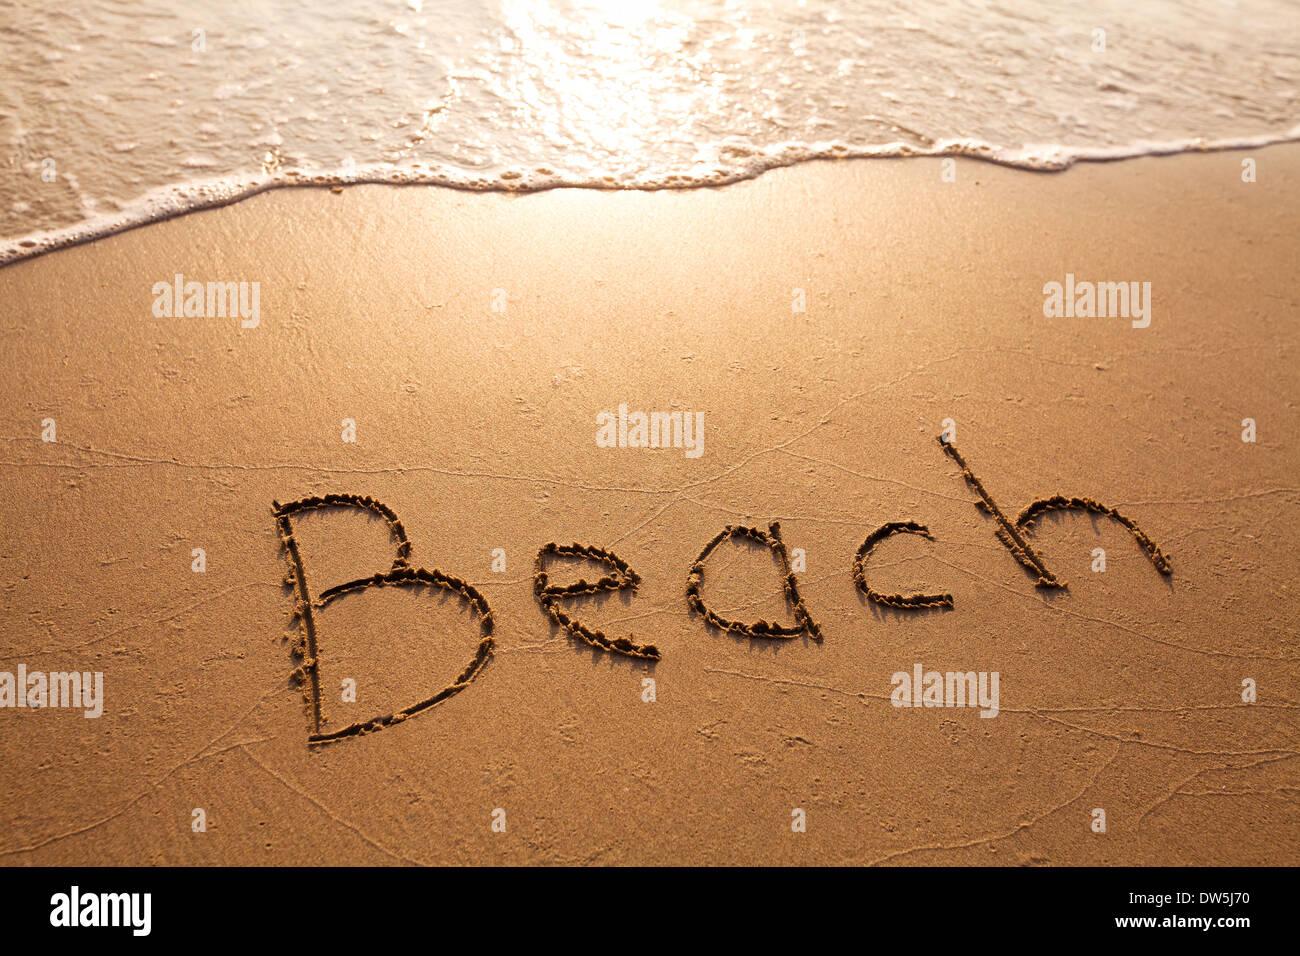 concepto de playa Imagen De Stock